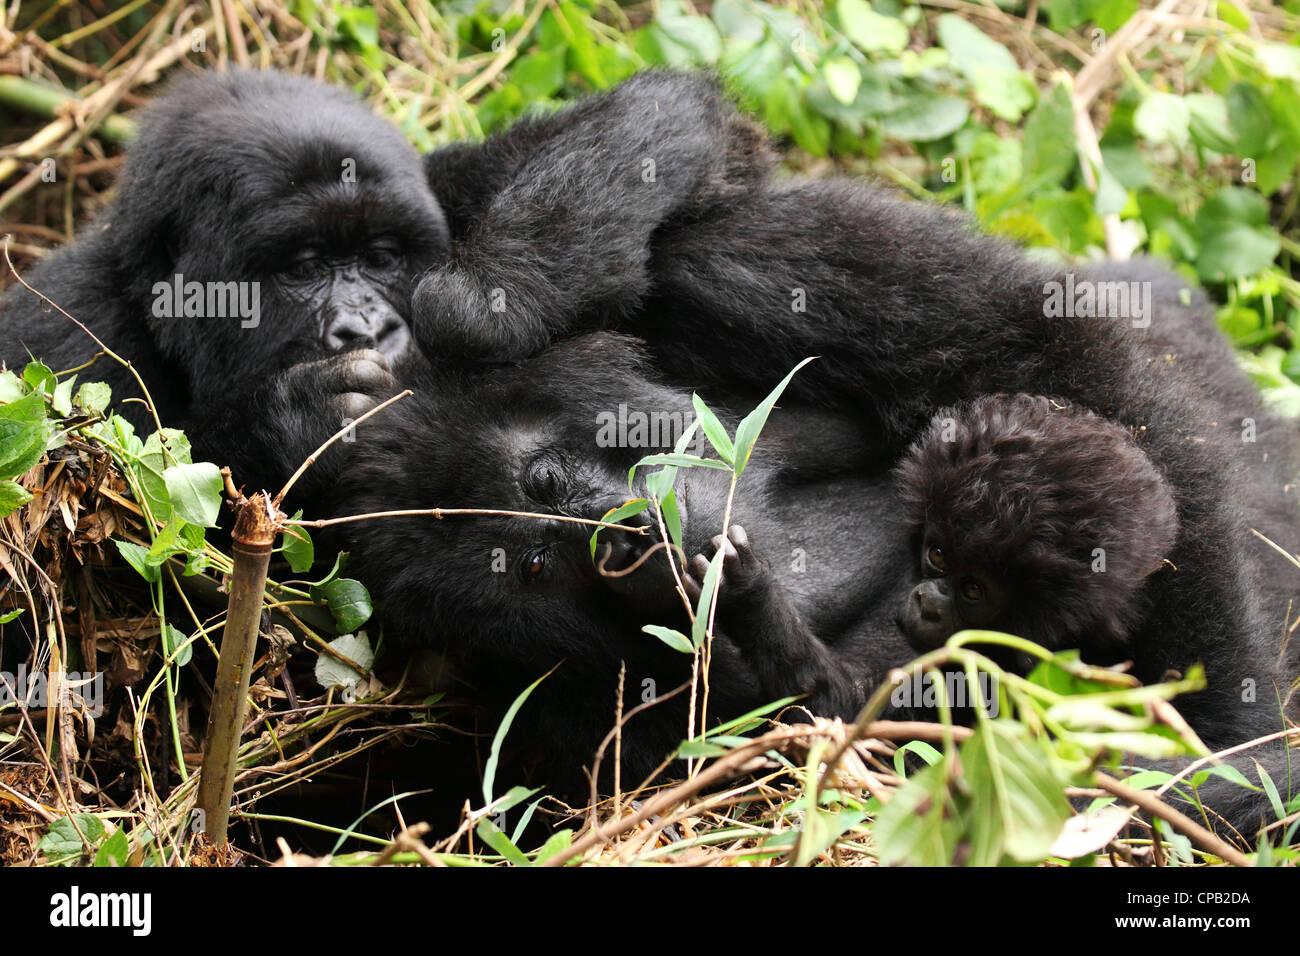 Mountain gorillas (Gorilla beringei beringei) grooming in the Volcanoes National Park, Rwanda. - Stock Image